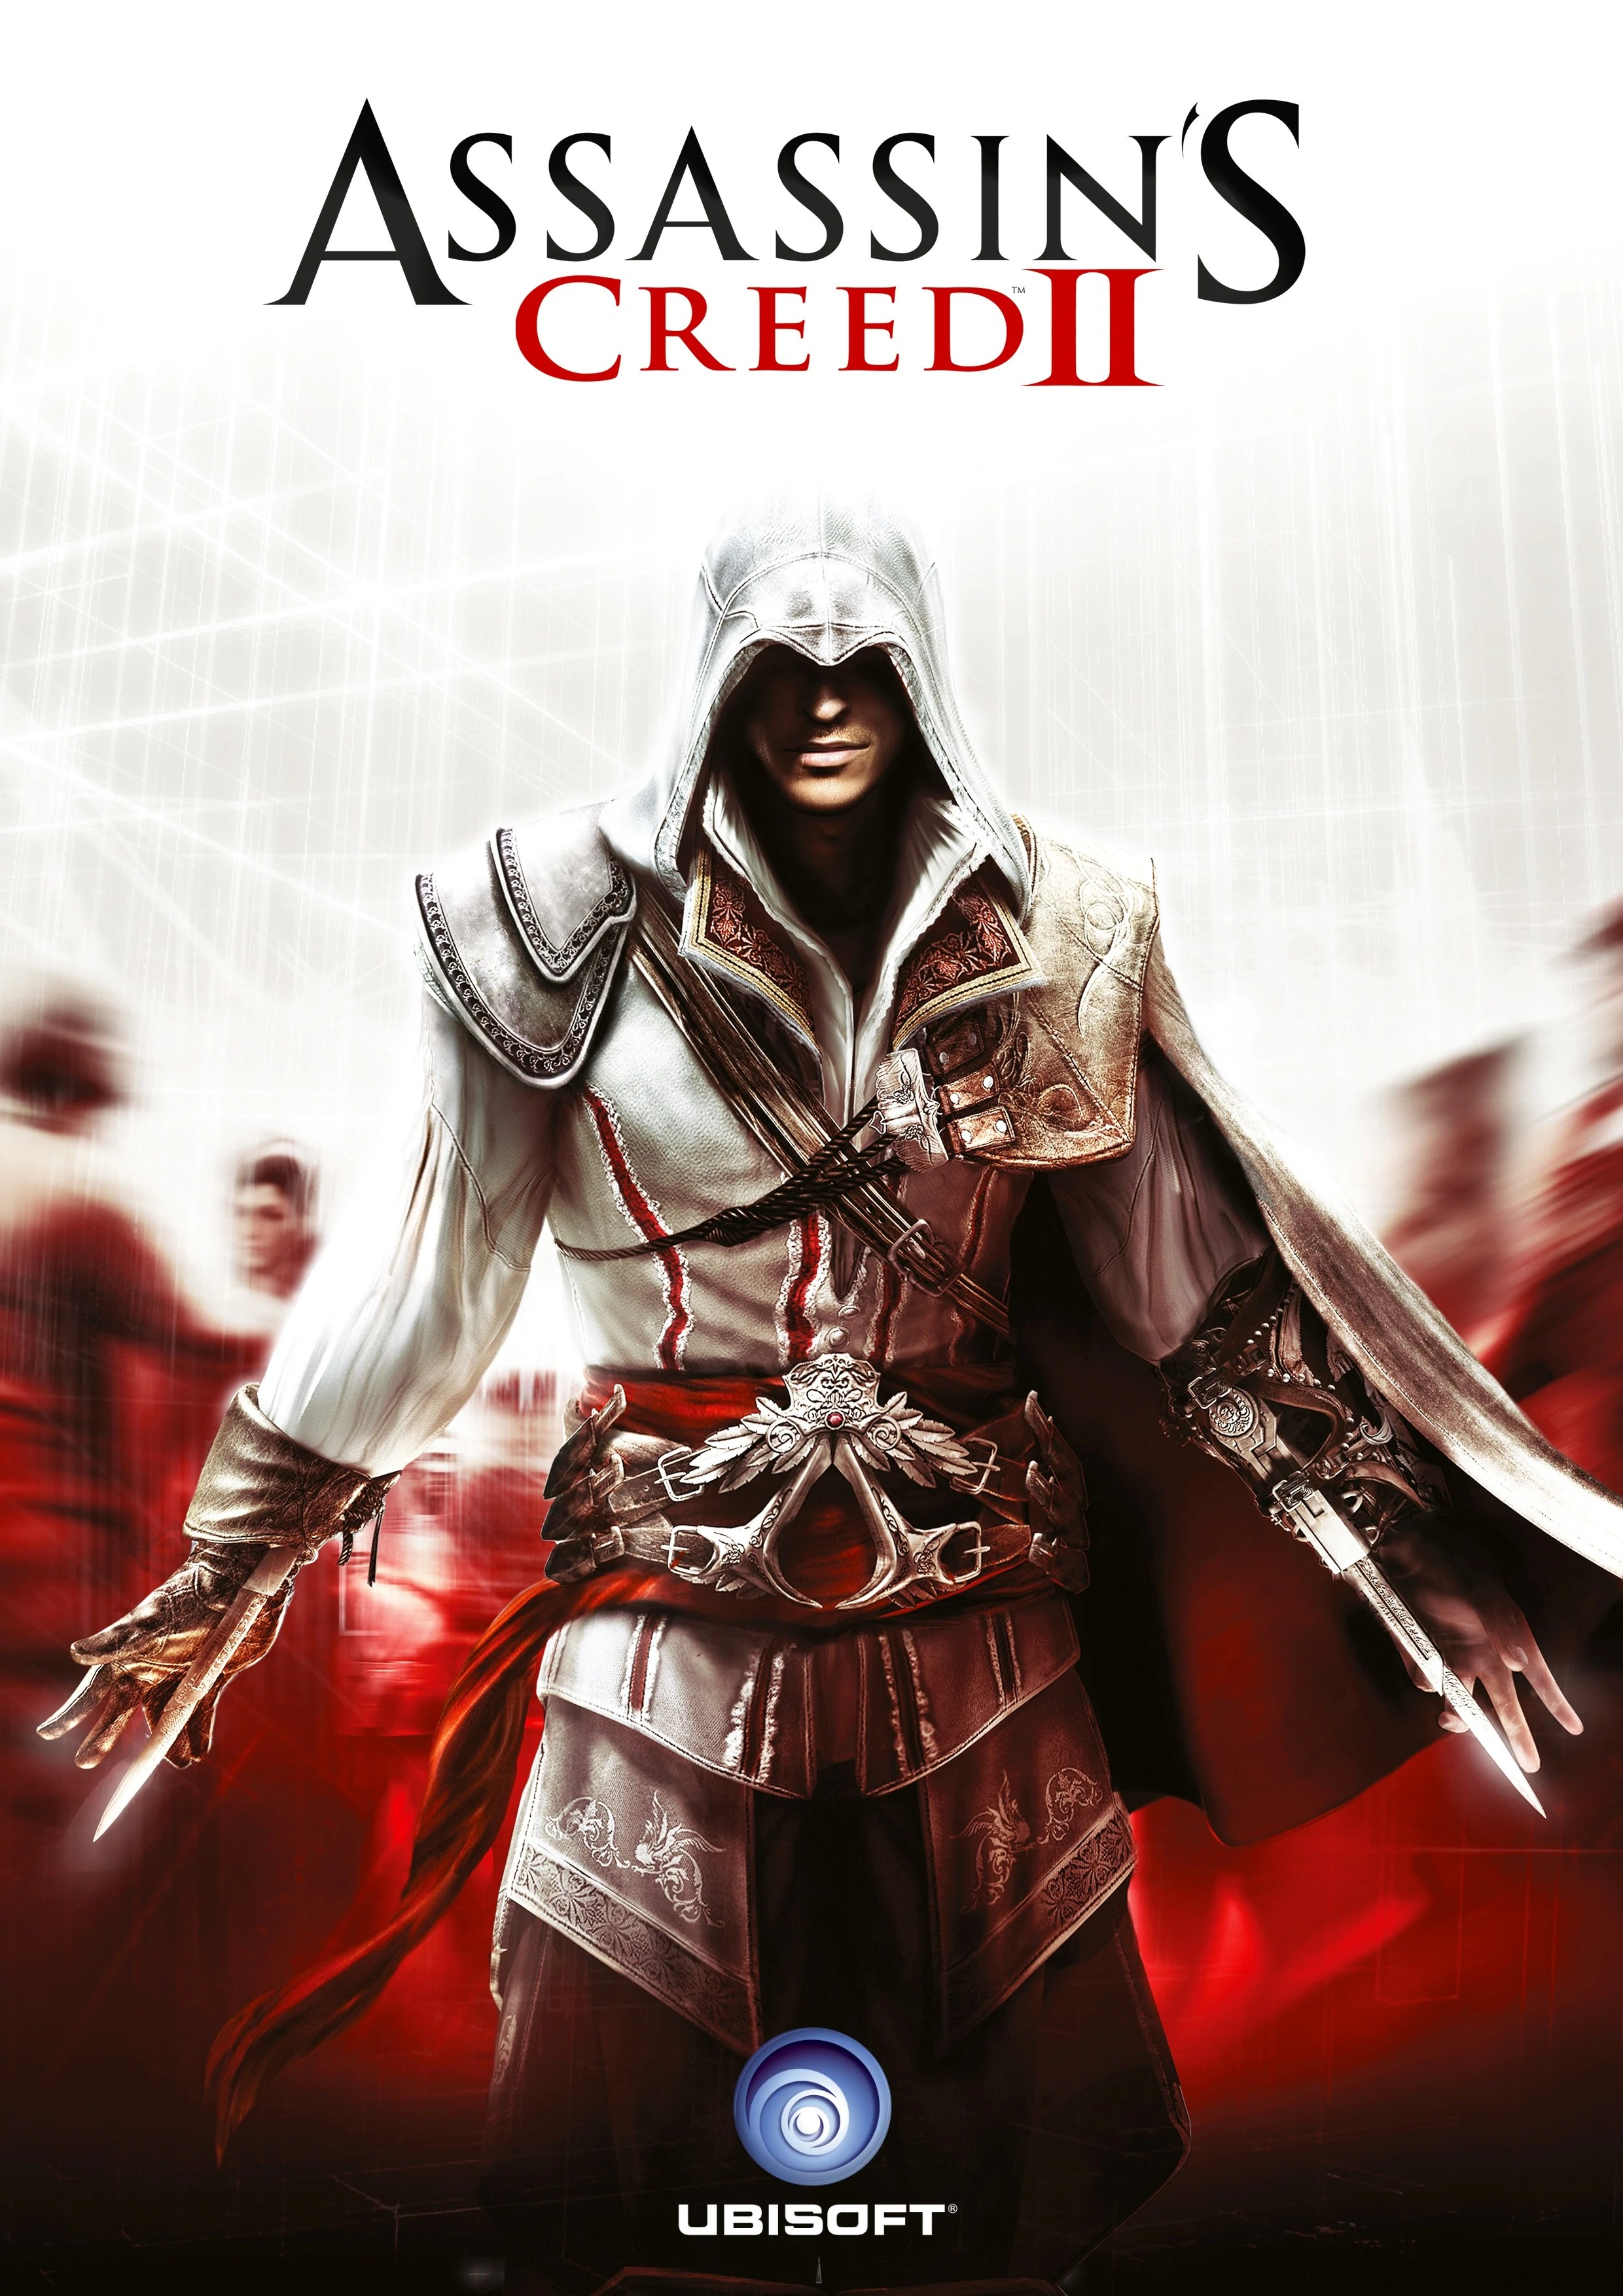 Assassins Creed II  Assassins Creed Wiki